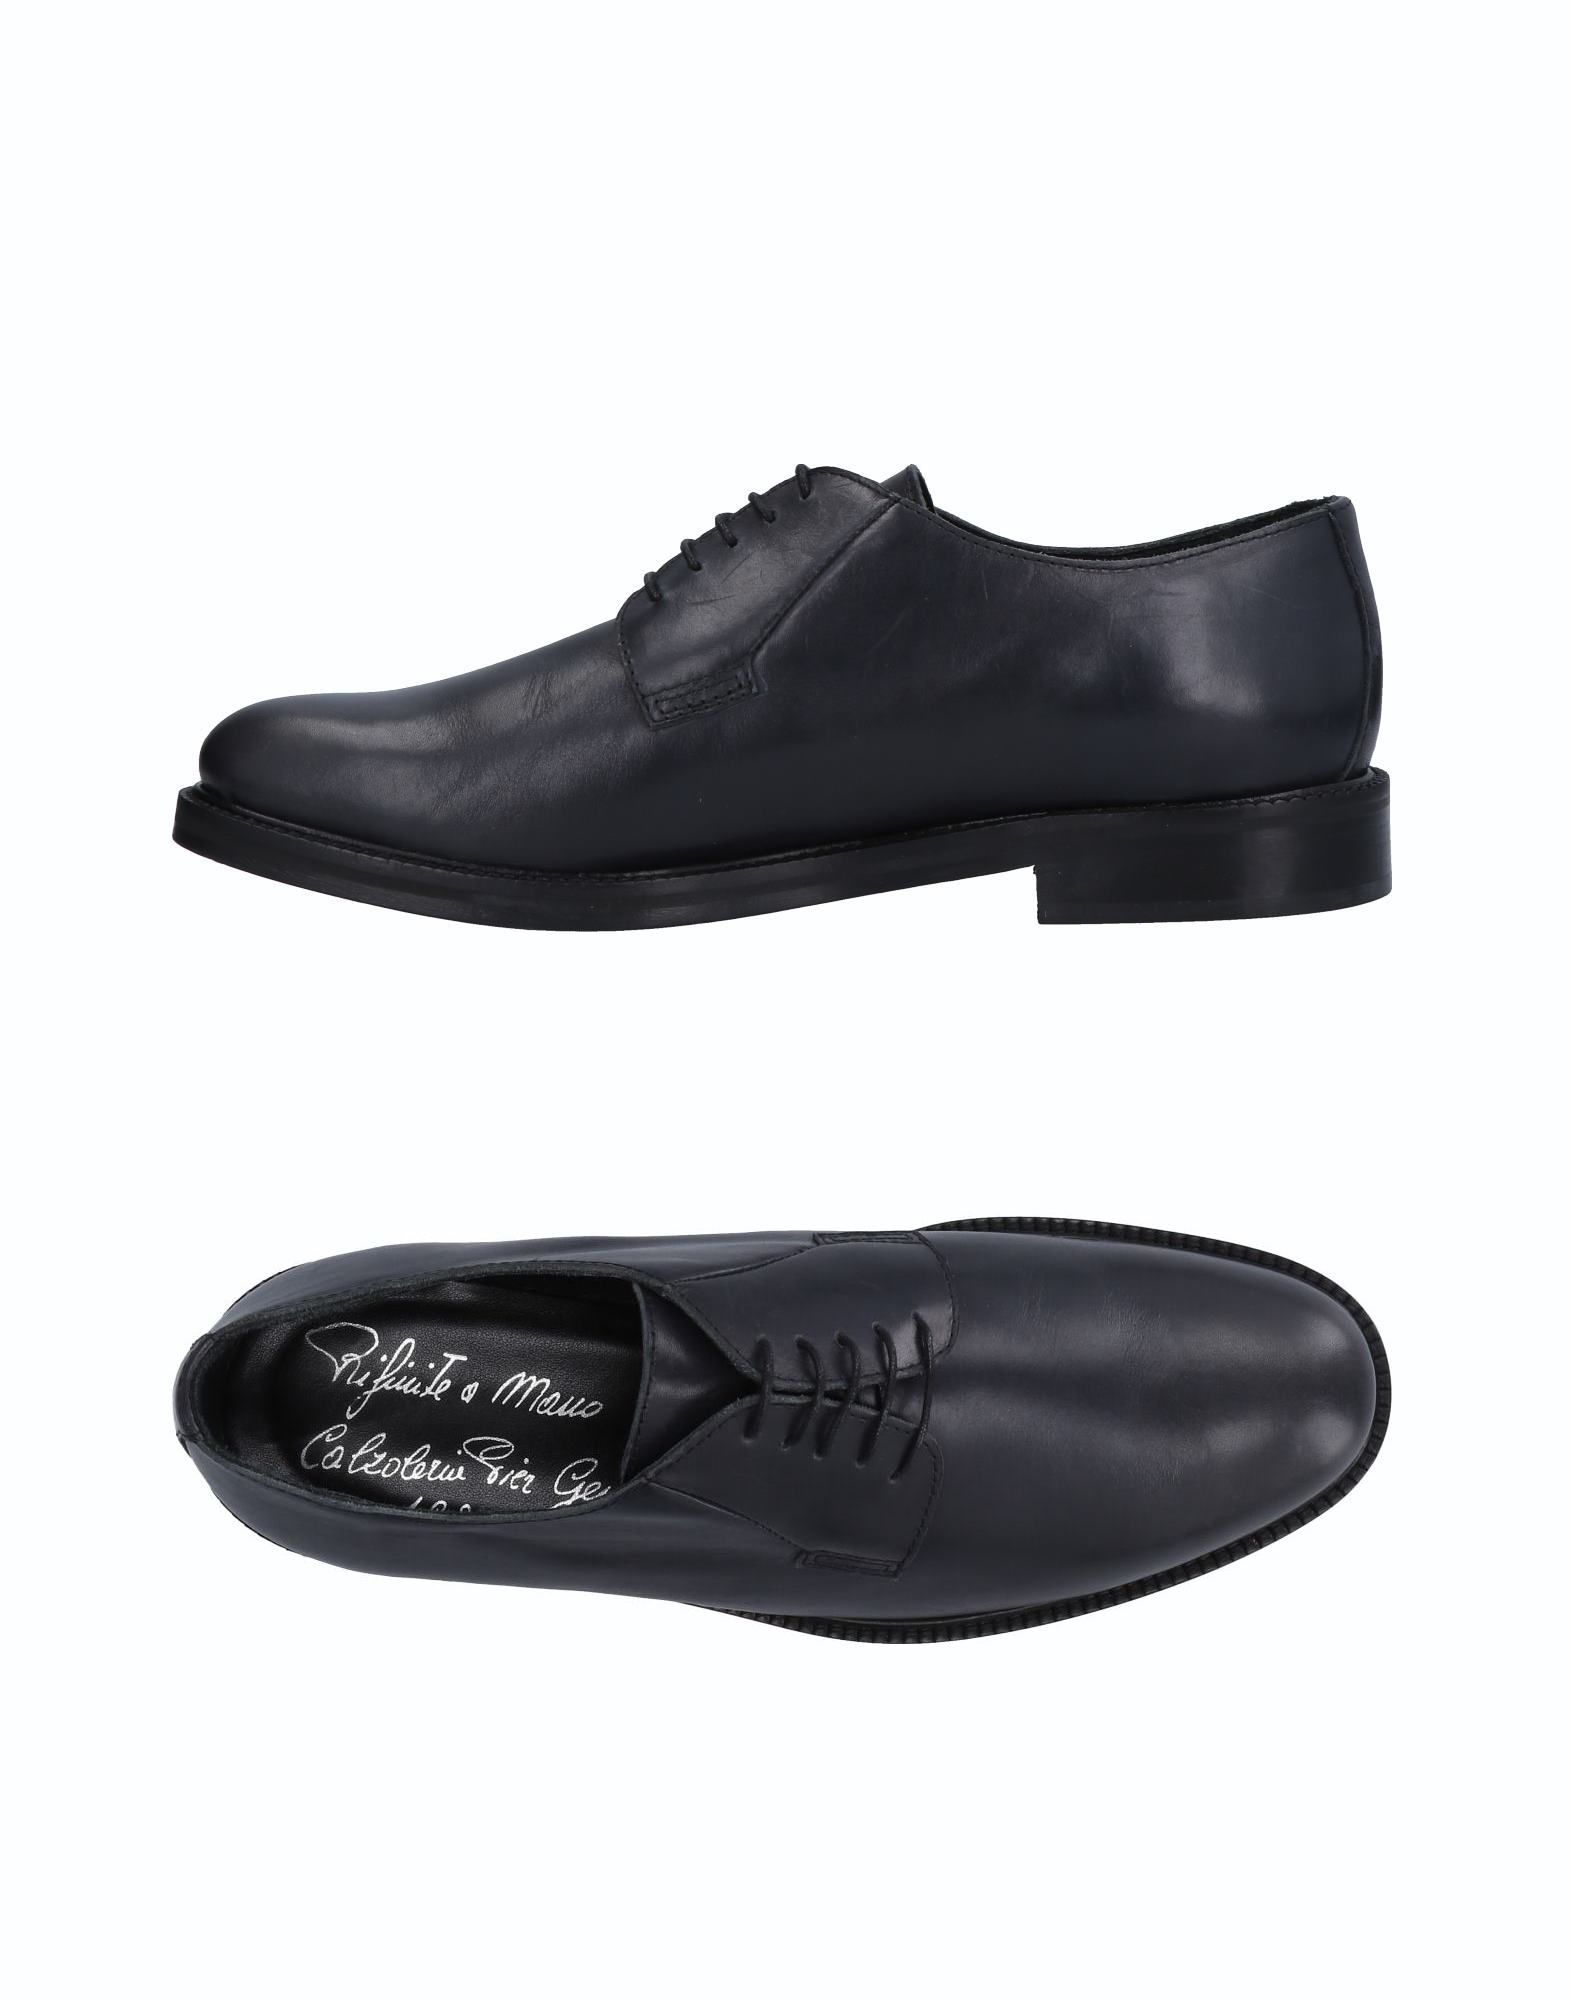 CALZOLERIA PIER GENTILI 1926 Обувь на шнурках